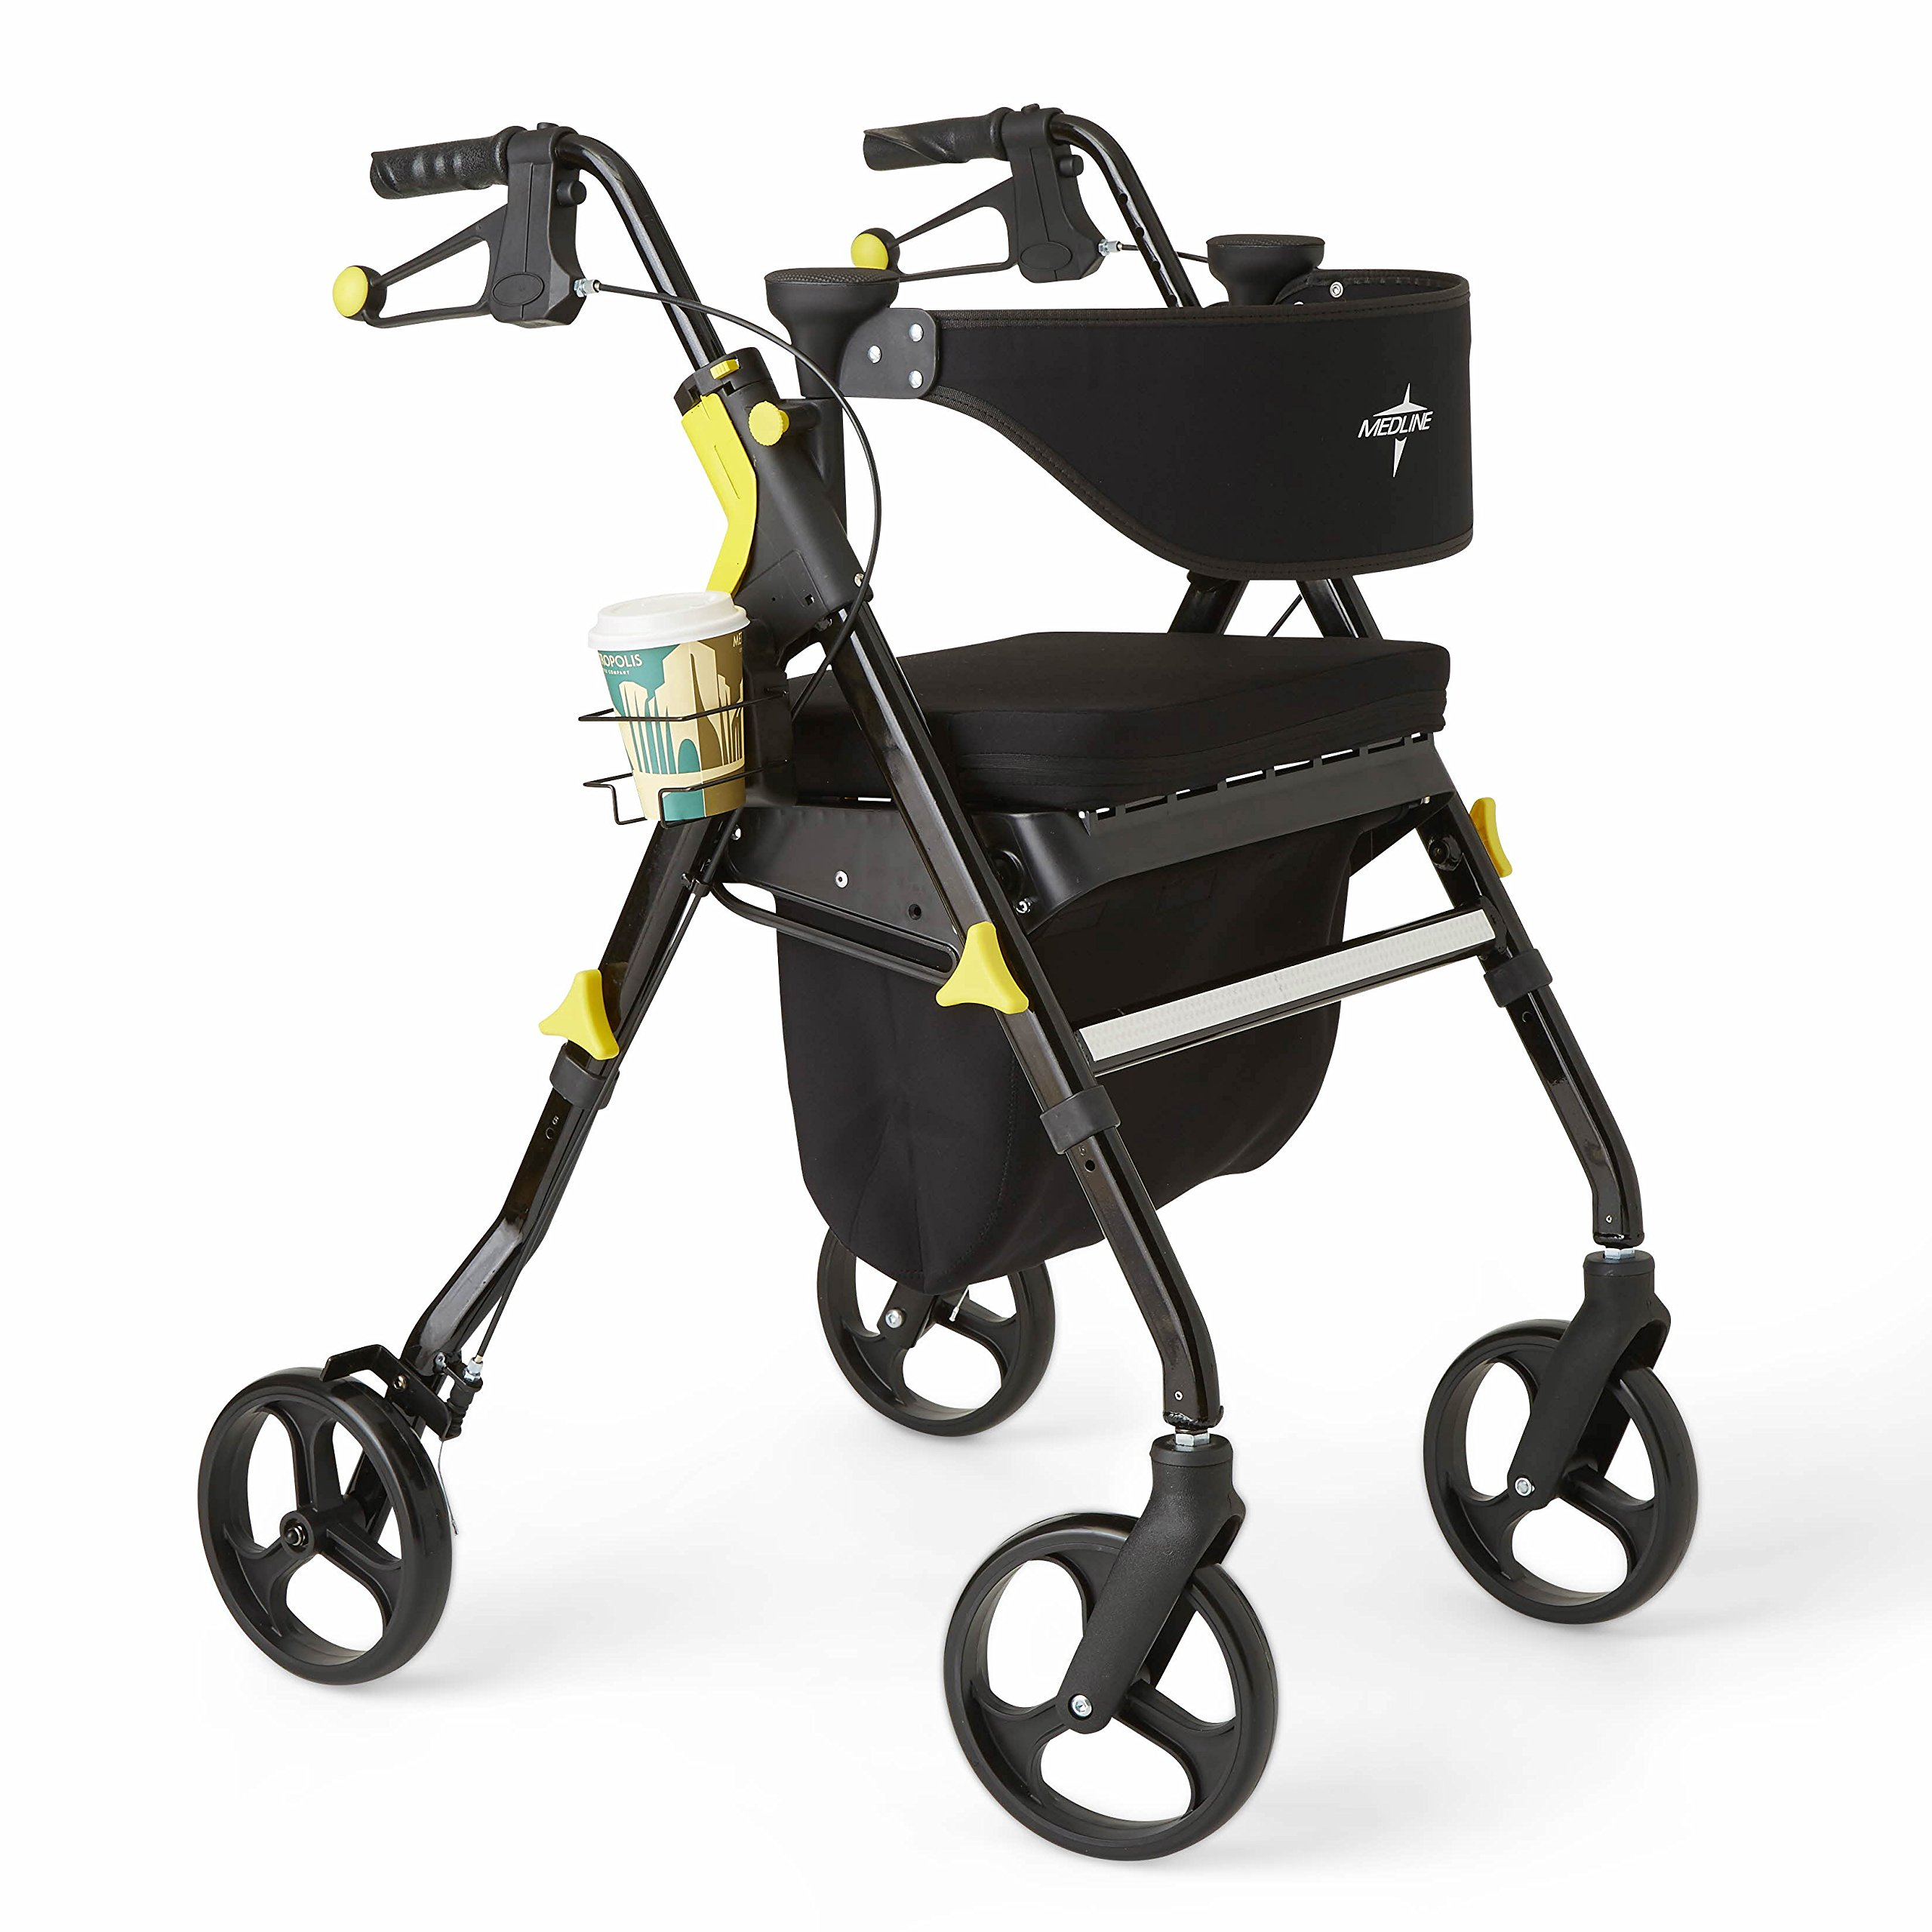 Medline Premium Empower Rollator Walker with Seat, Folding Rolling Walker with 8-inch Wheels, Black by Medline